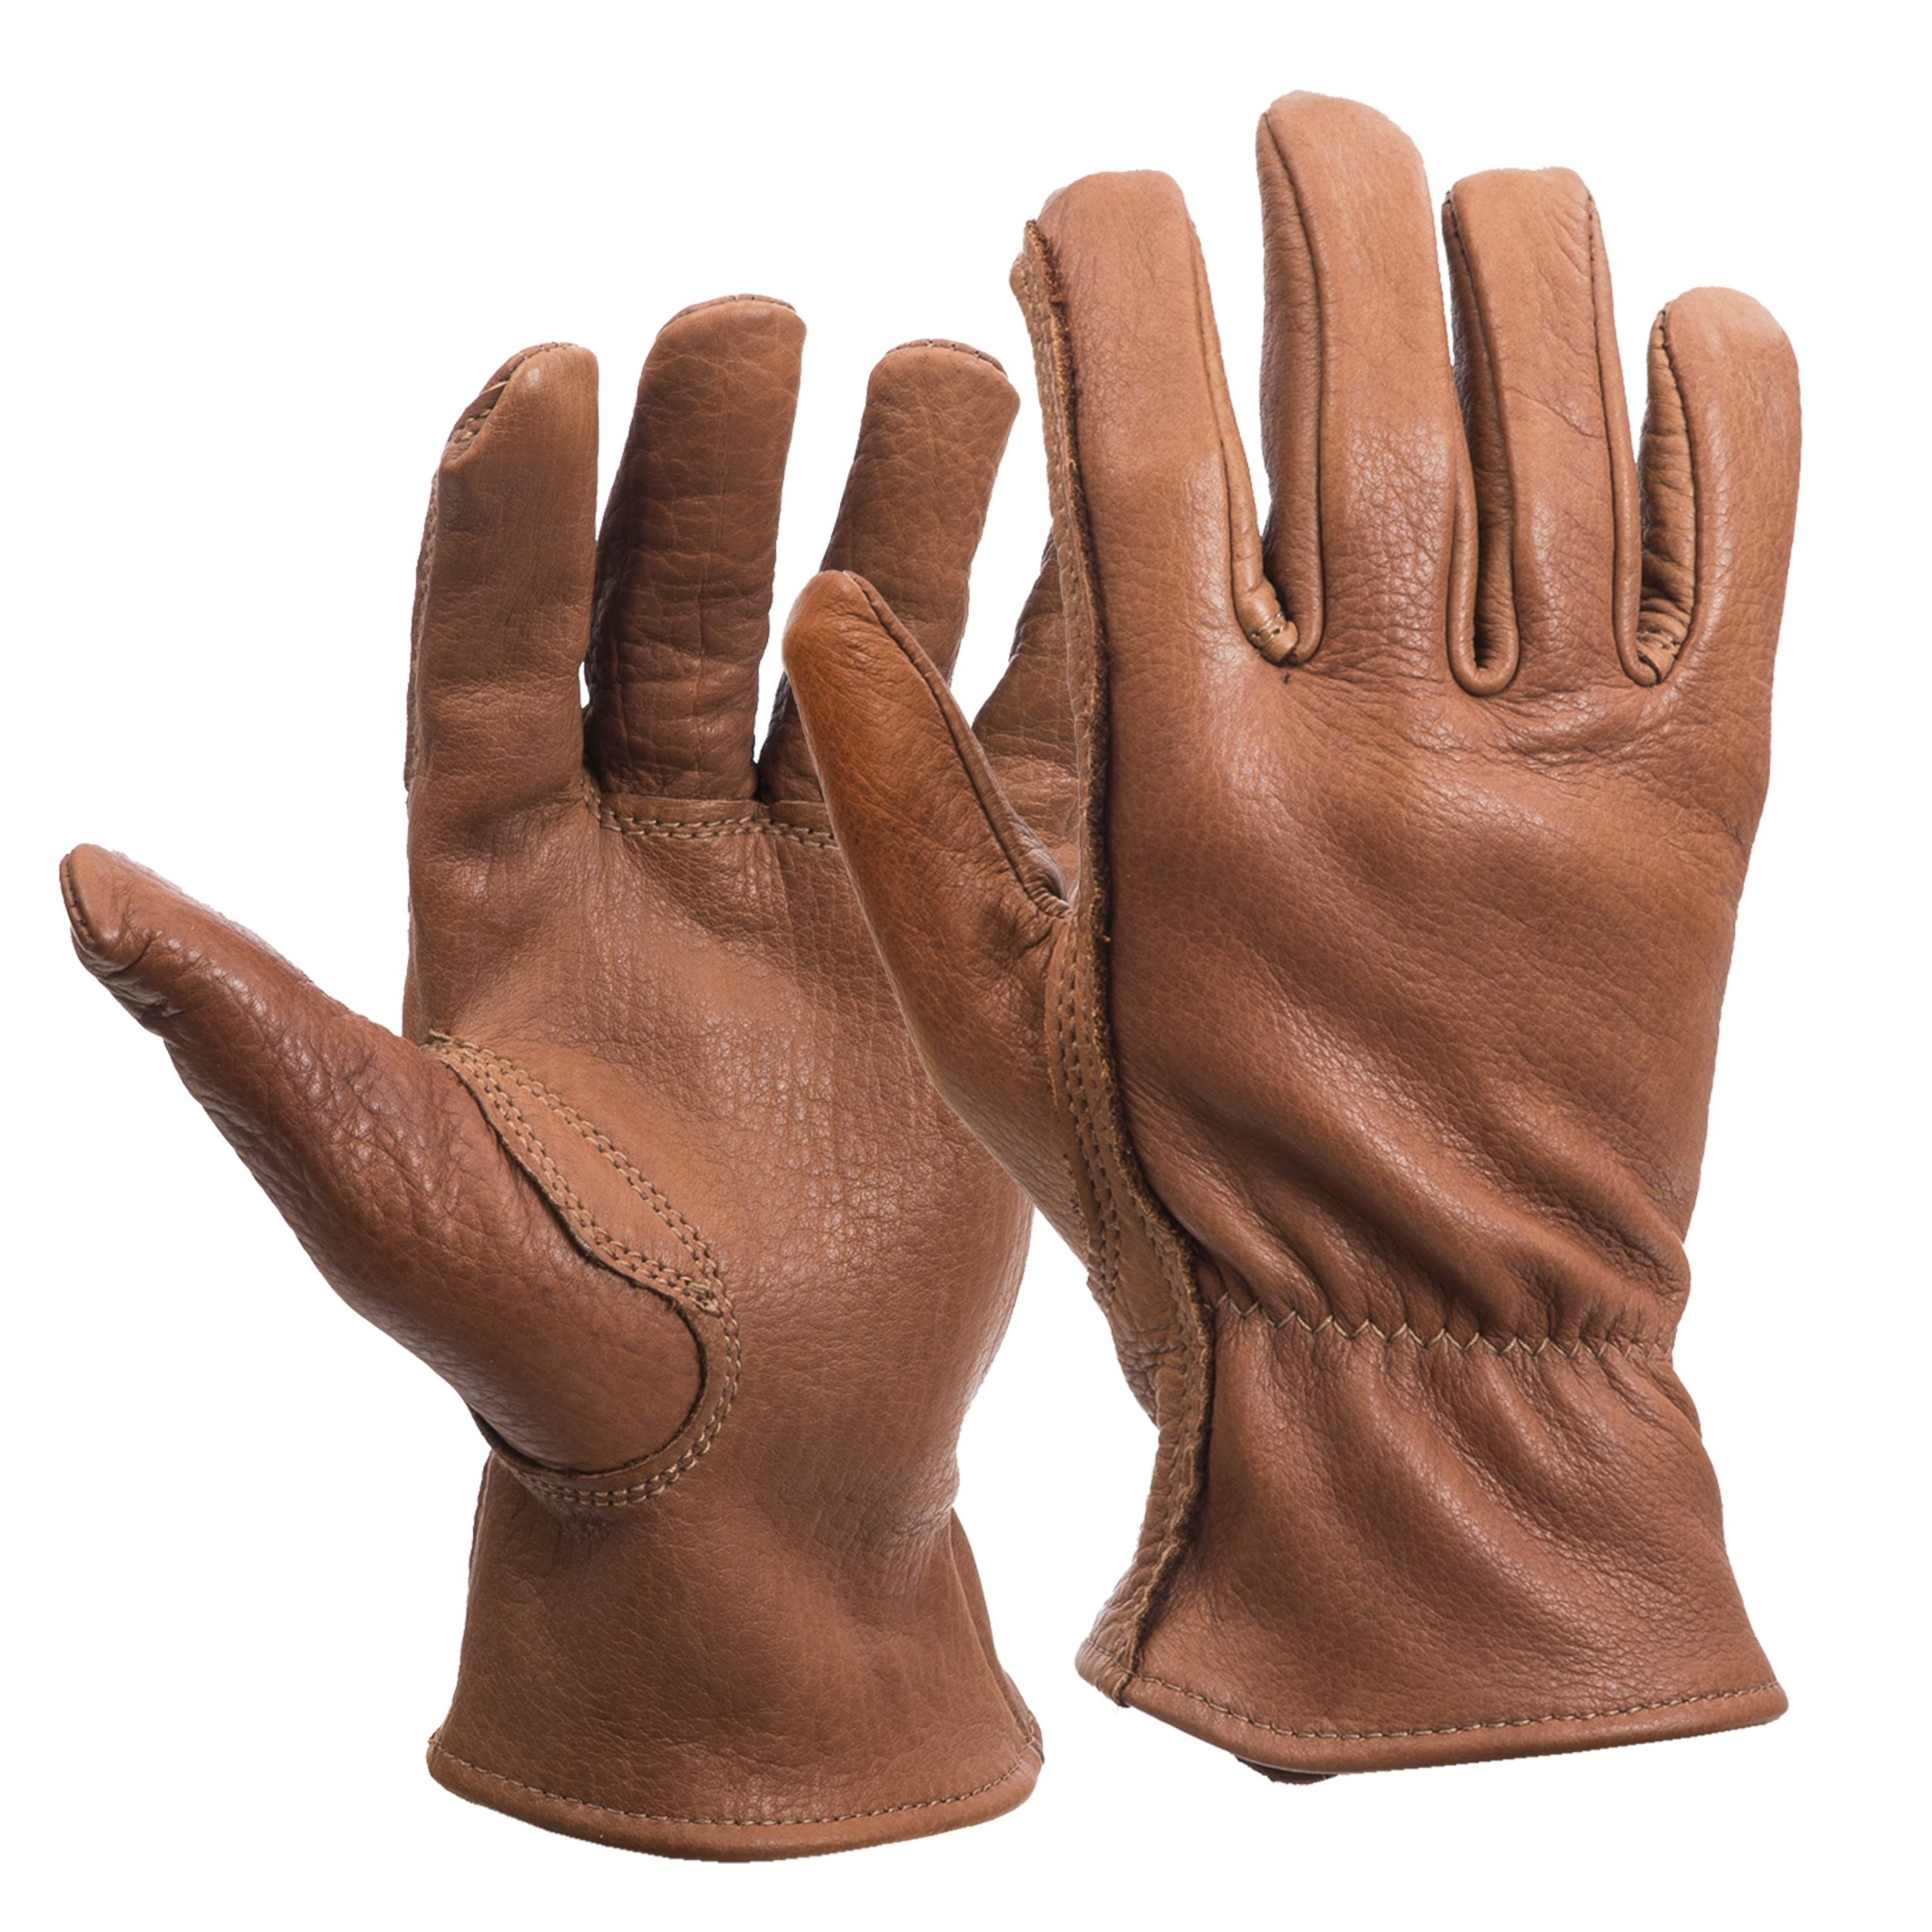 Midwest Gloves & Gear 850-S-AZ-6 USA Glove, Small, Buffalo